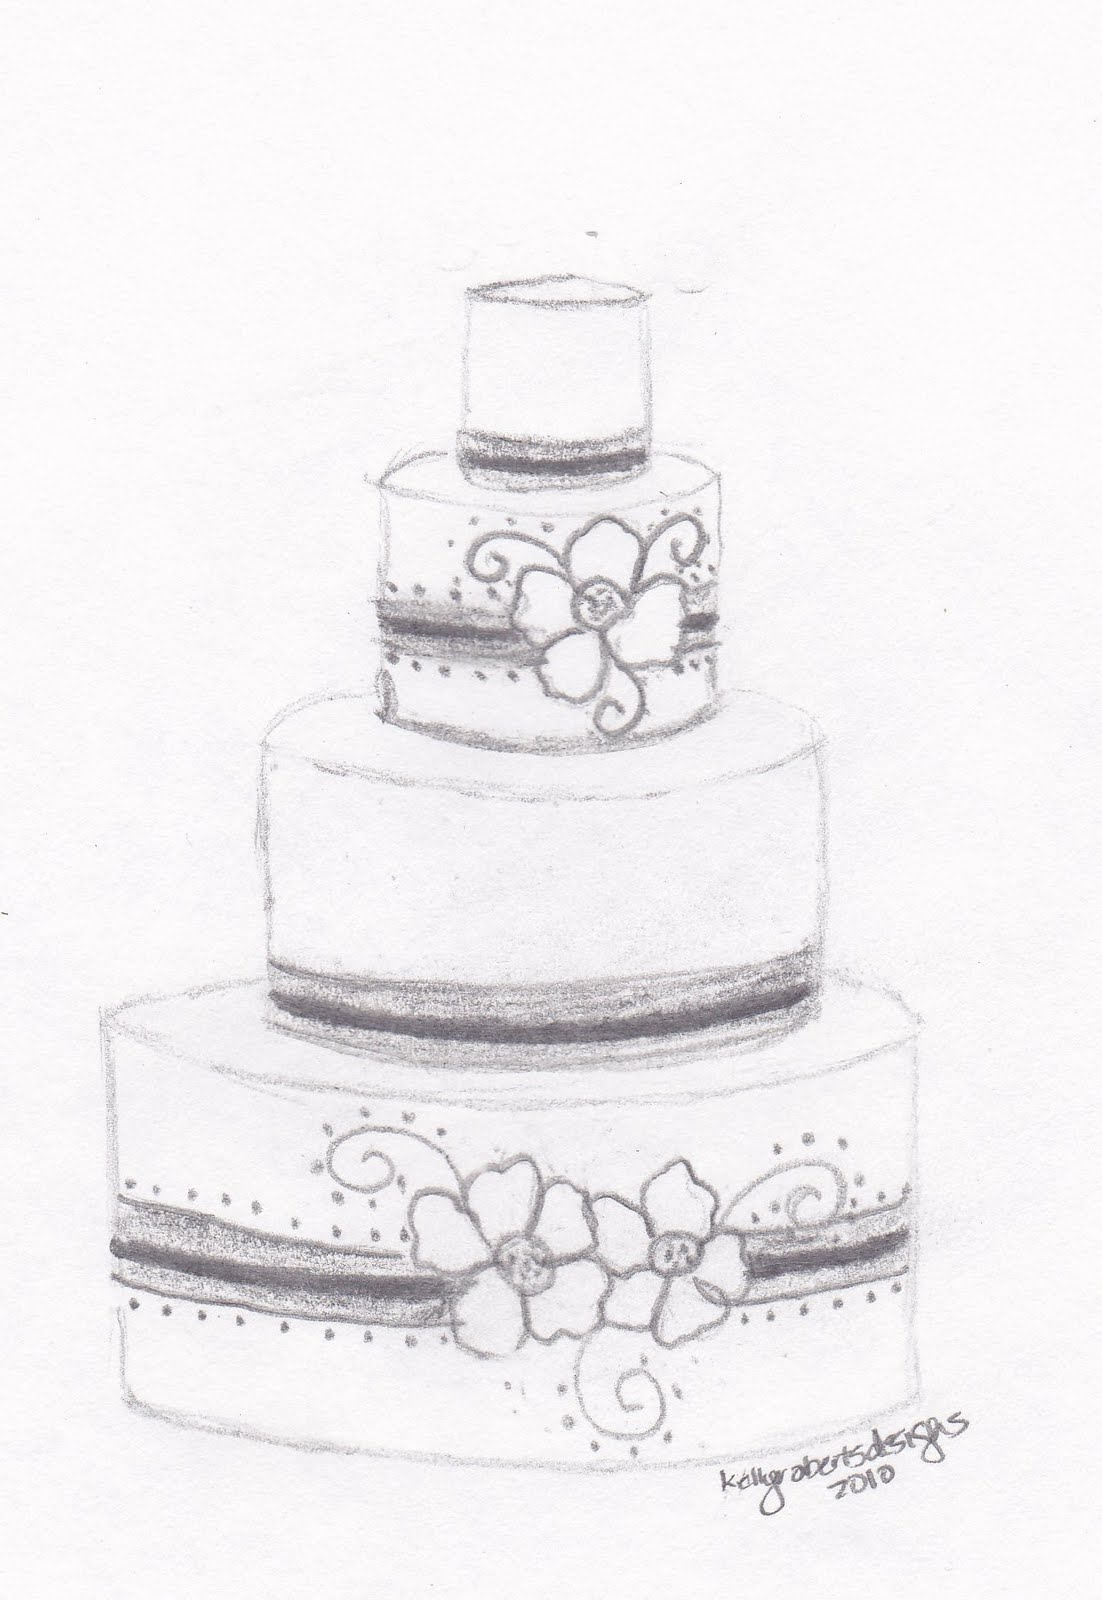 Sugar Sketch Cake Design : Kelly Roberts Designs: Wedding or Celebration Cake Design ...